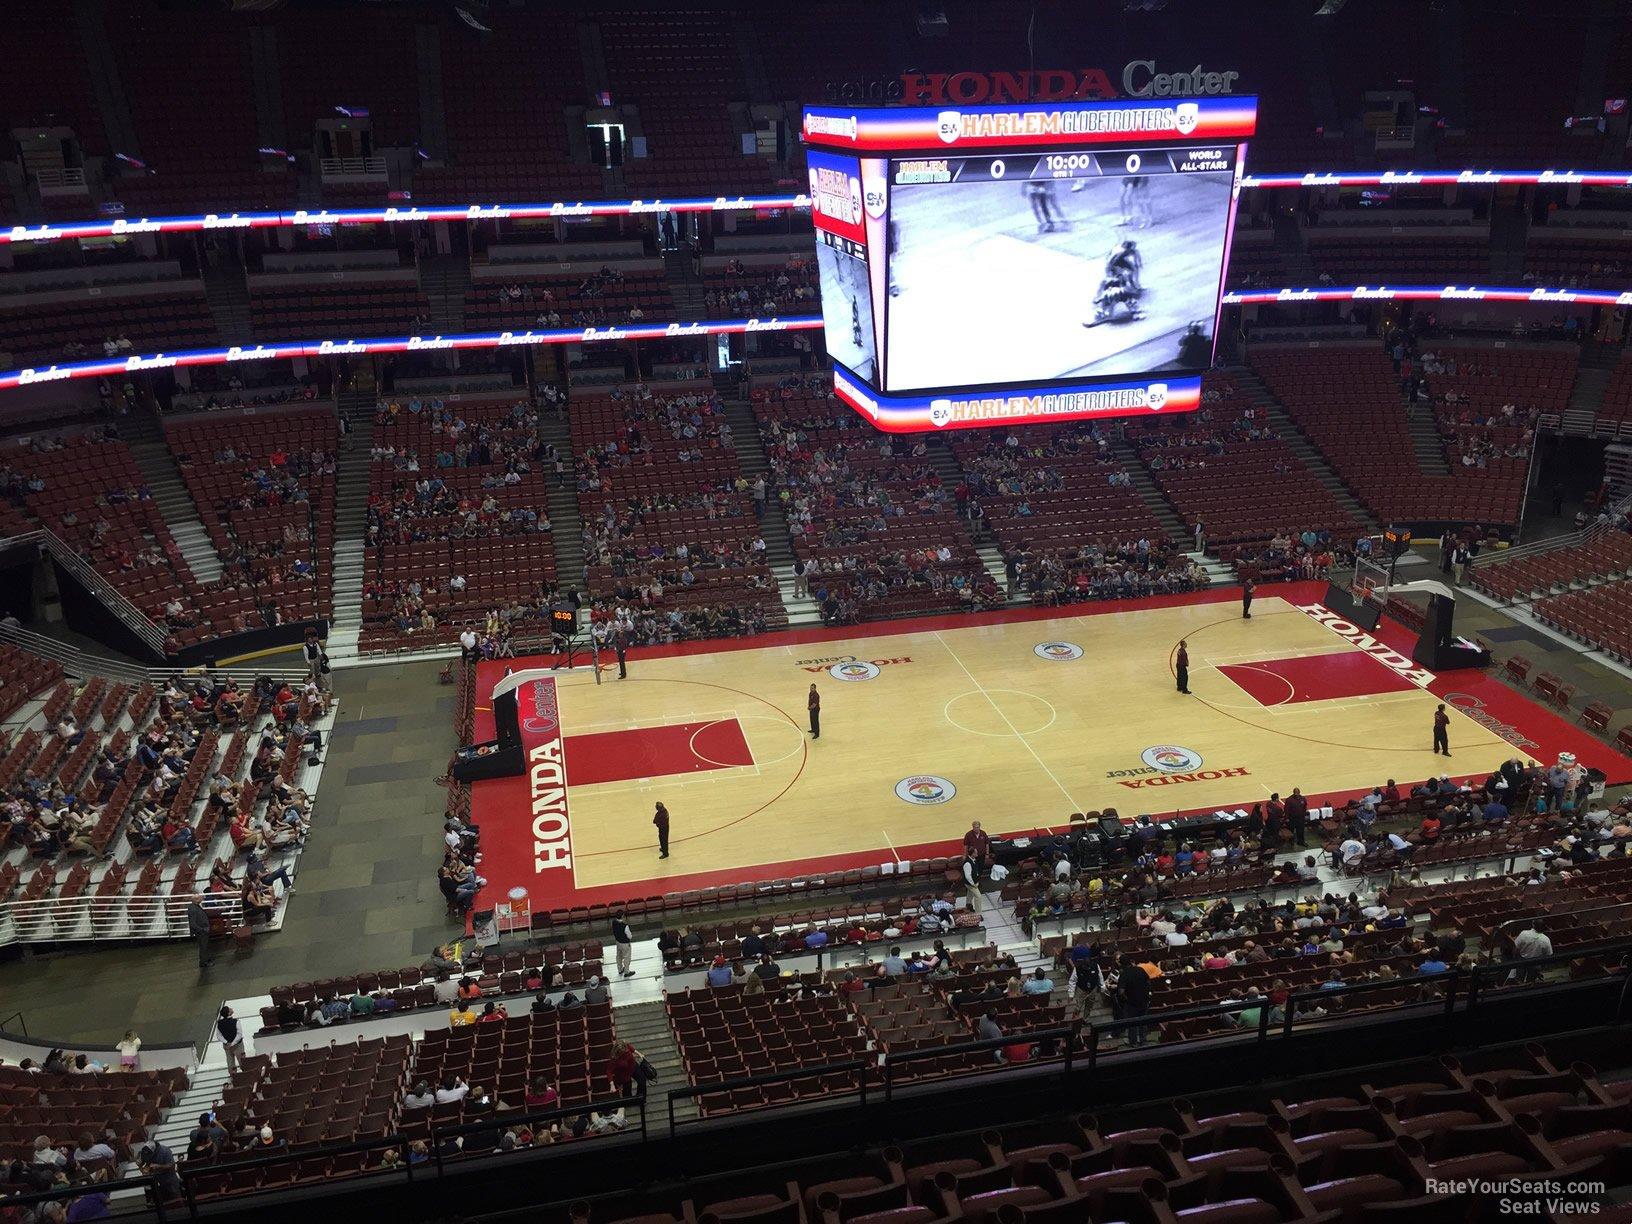 Honda Center Section 413 Basketball Seating Rateyourseats Com